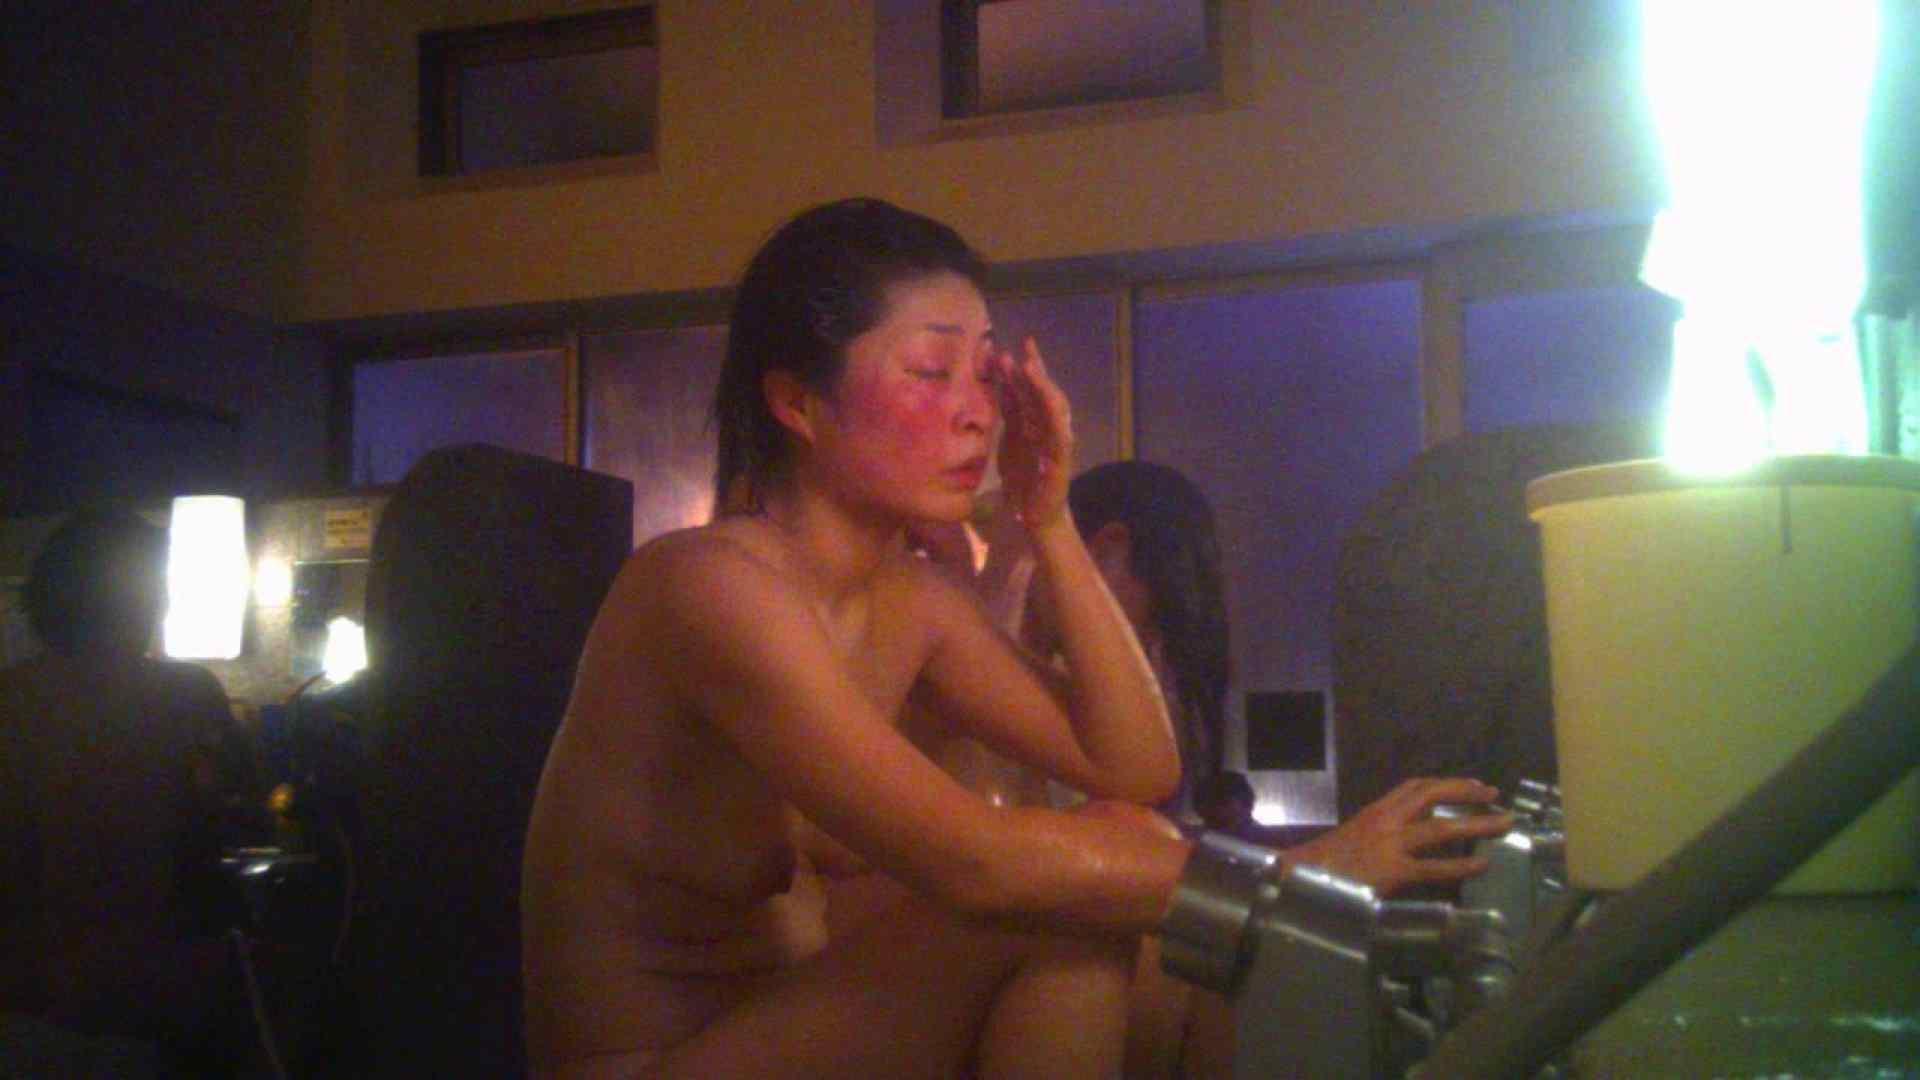 TG.21 【上等兵】井戸端会議が大好きな奥さん 潜入エロ調査   女風呂ハメ撮り  51連発 41